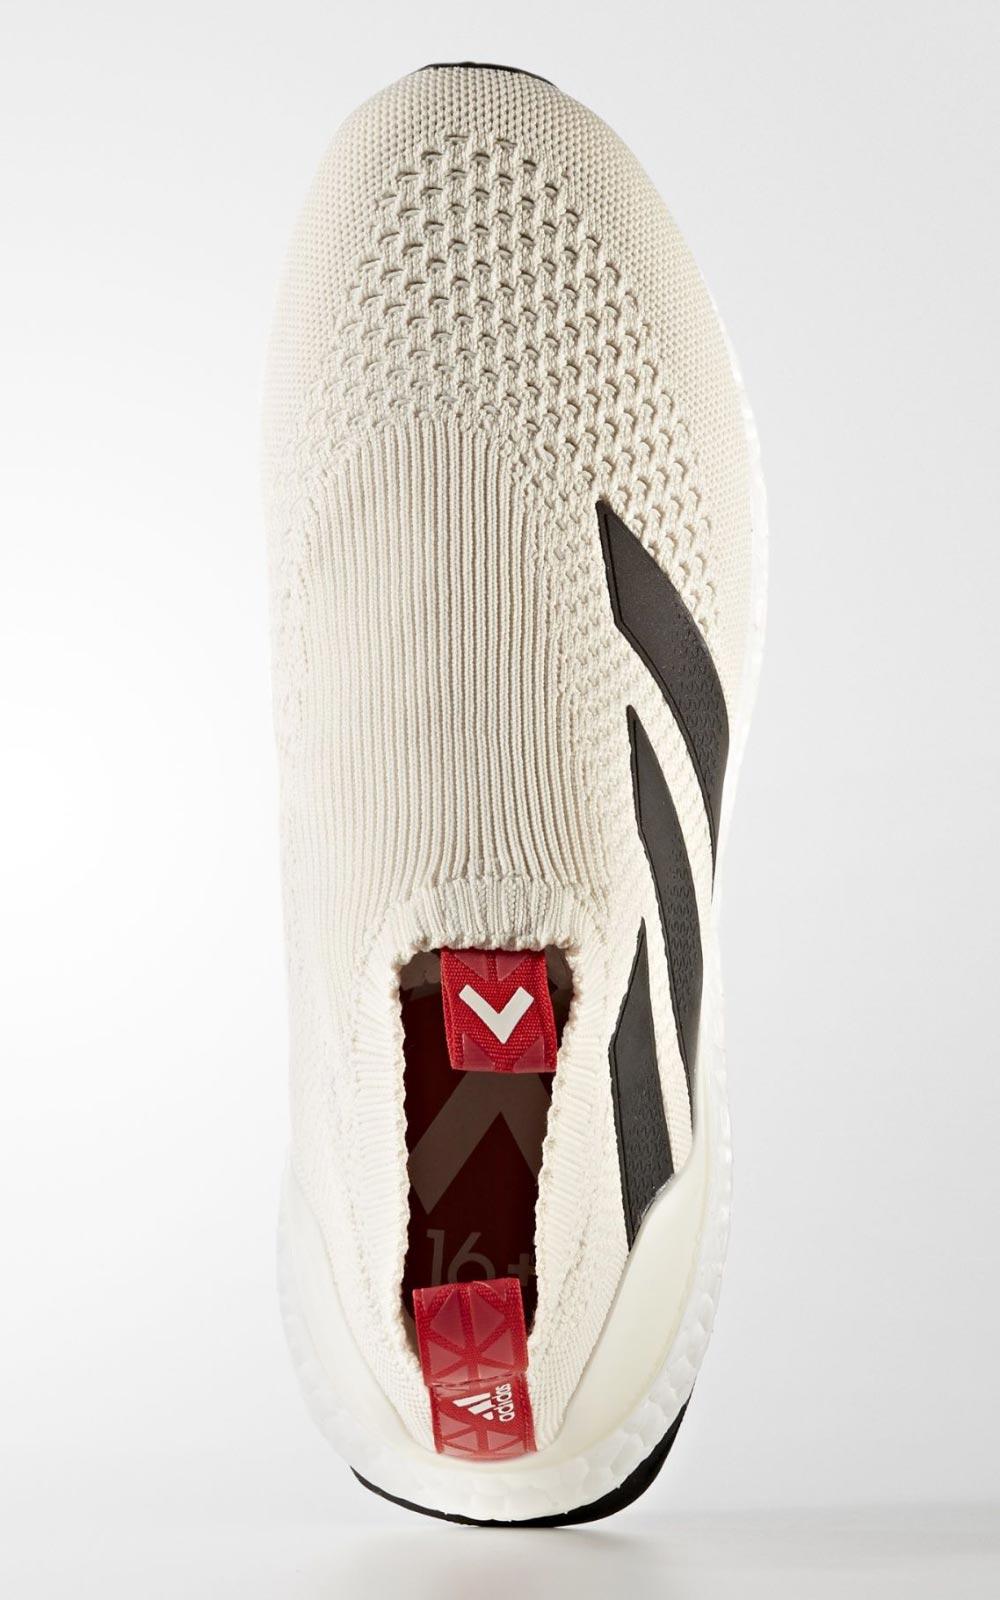 Ultra Boost 'Tan Cream' Adidas AQ5559 Tan/Cream